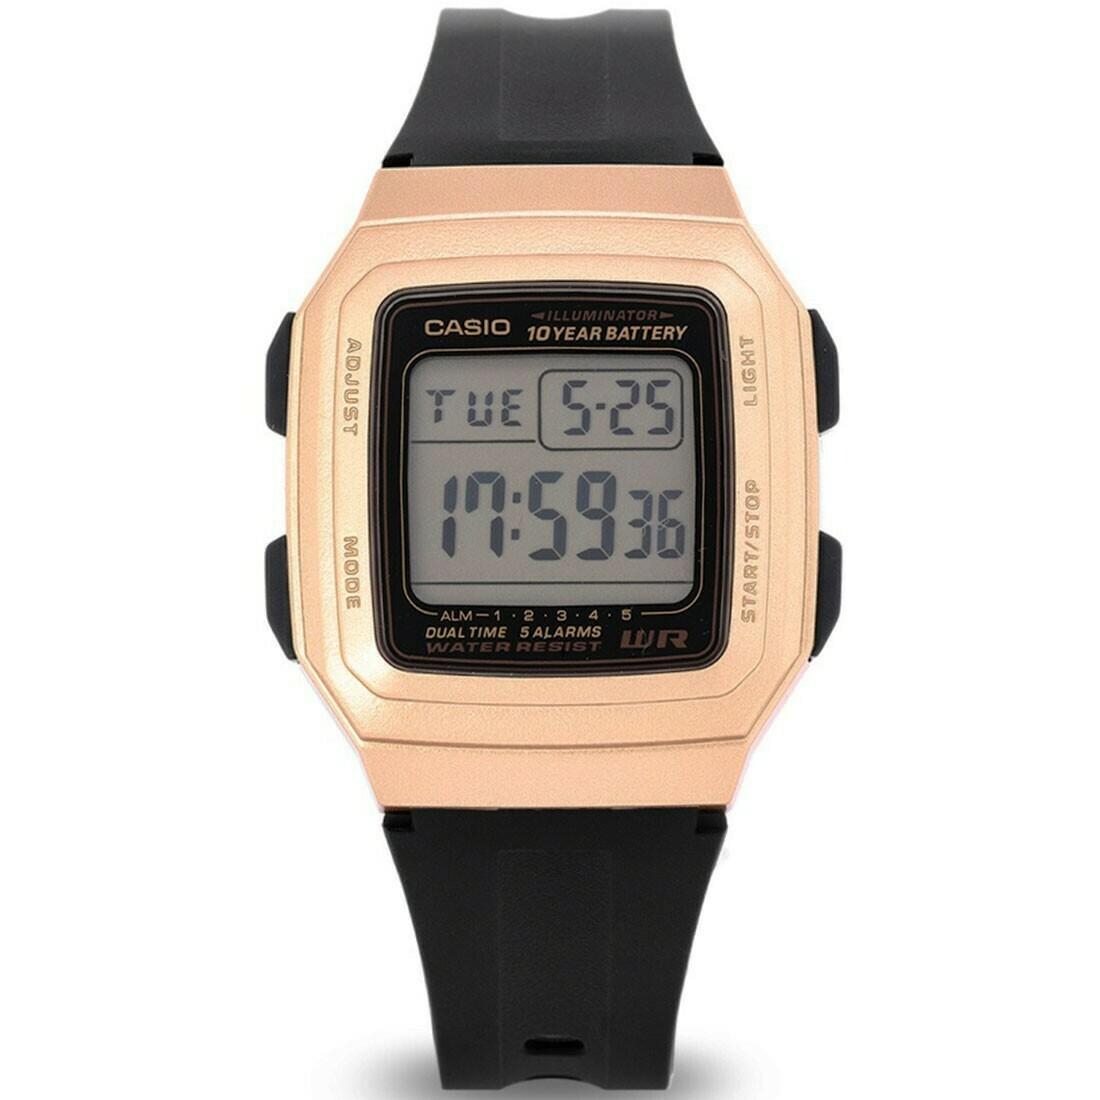 Reloj unisex Casio F201WAM-9A alarmas crono 34mm